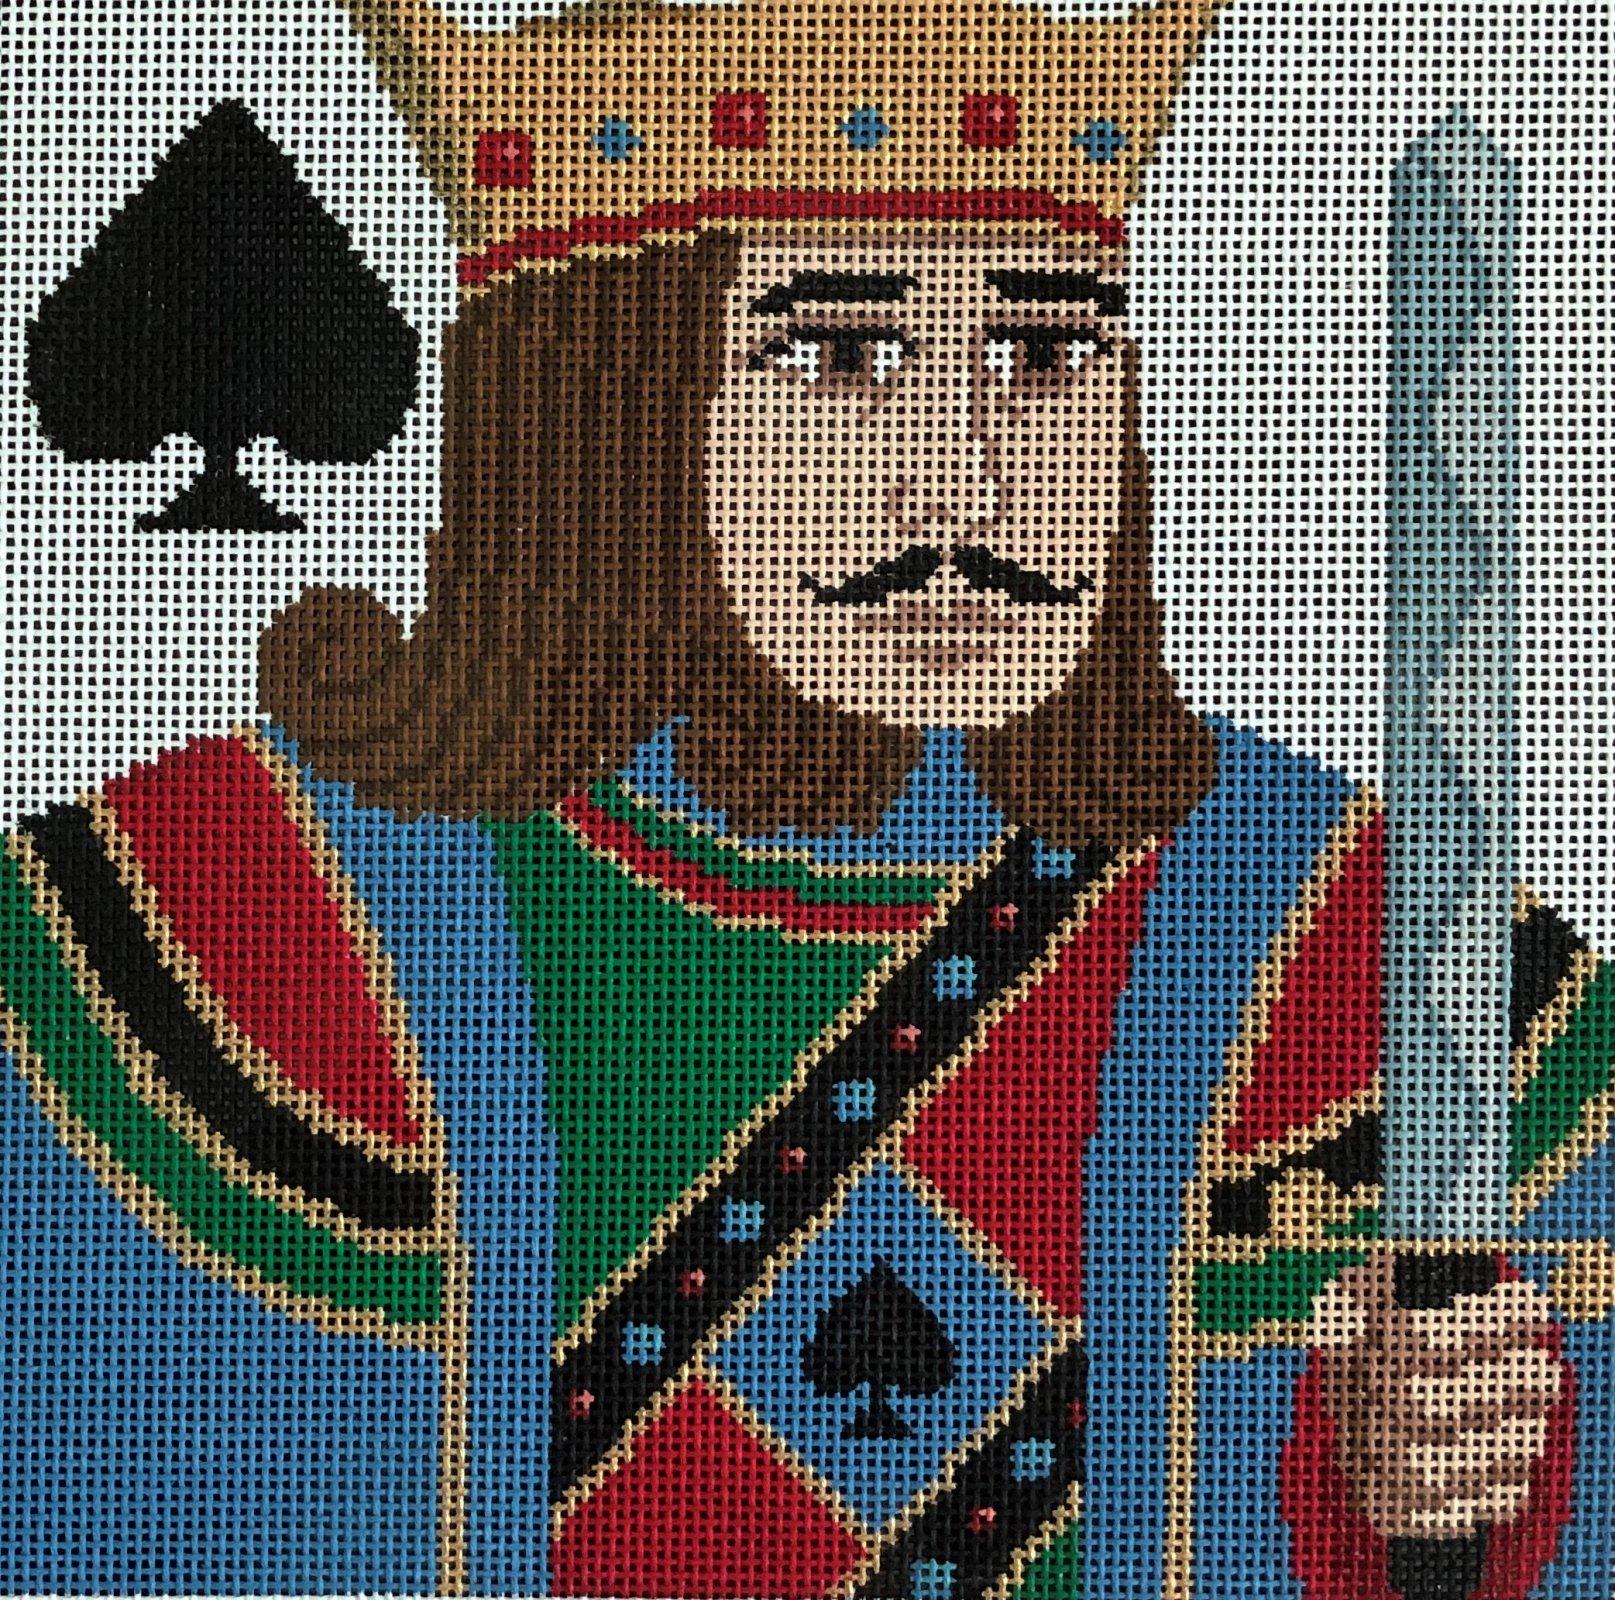 0791 - KING OF SPADES